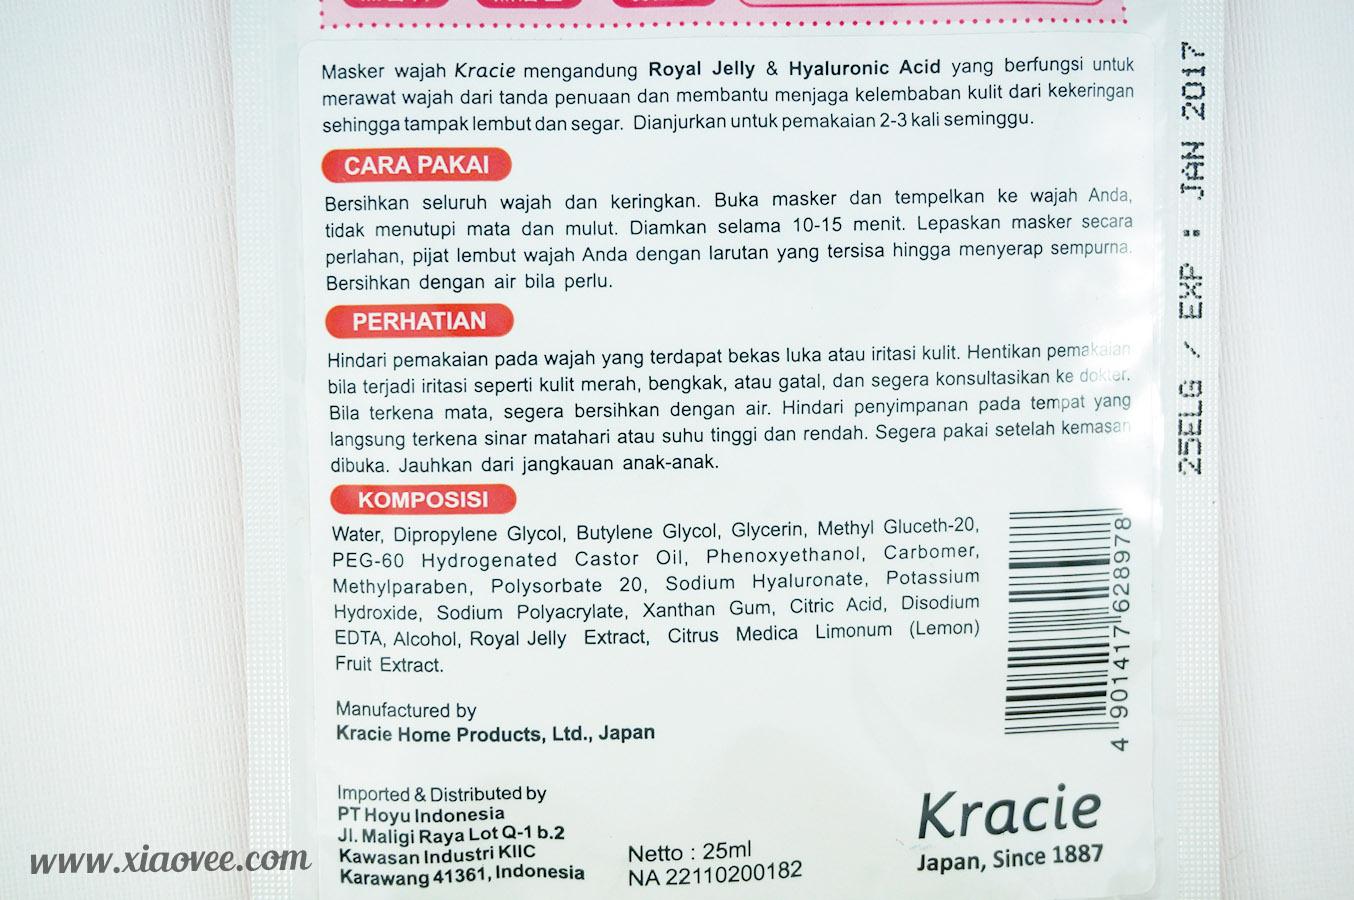 Kracie Hadabisei, Kracie Hadabisei Facial Mask, Kracie Hadabisei Sheet Mask Red